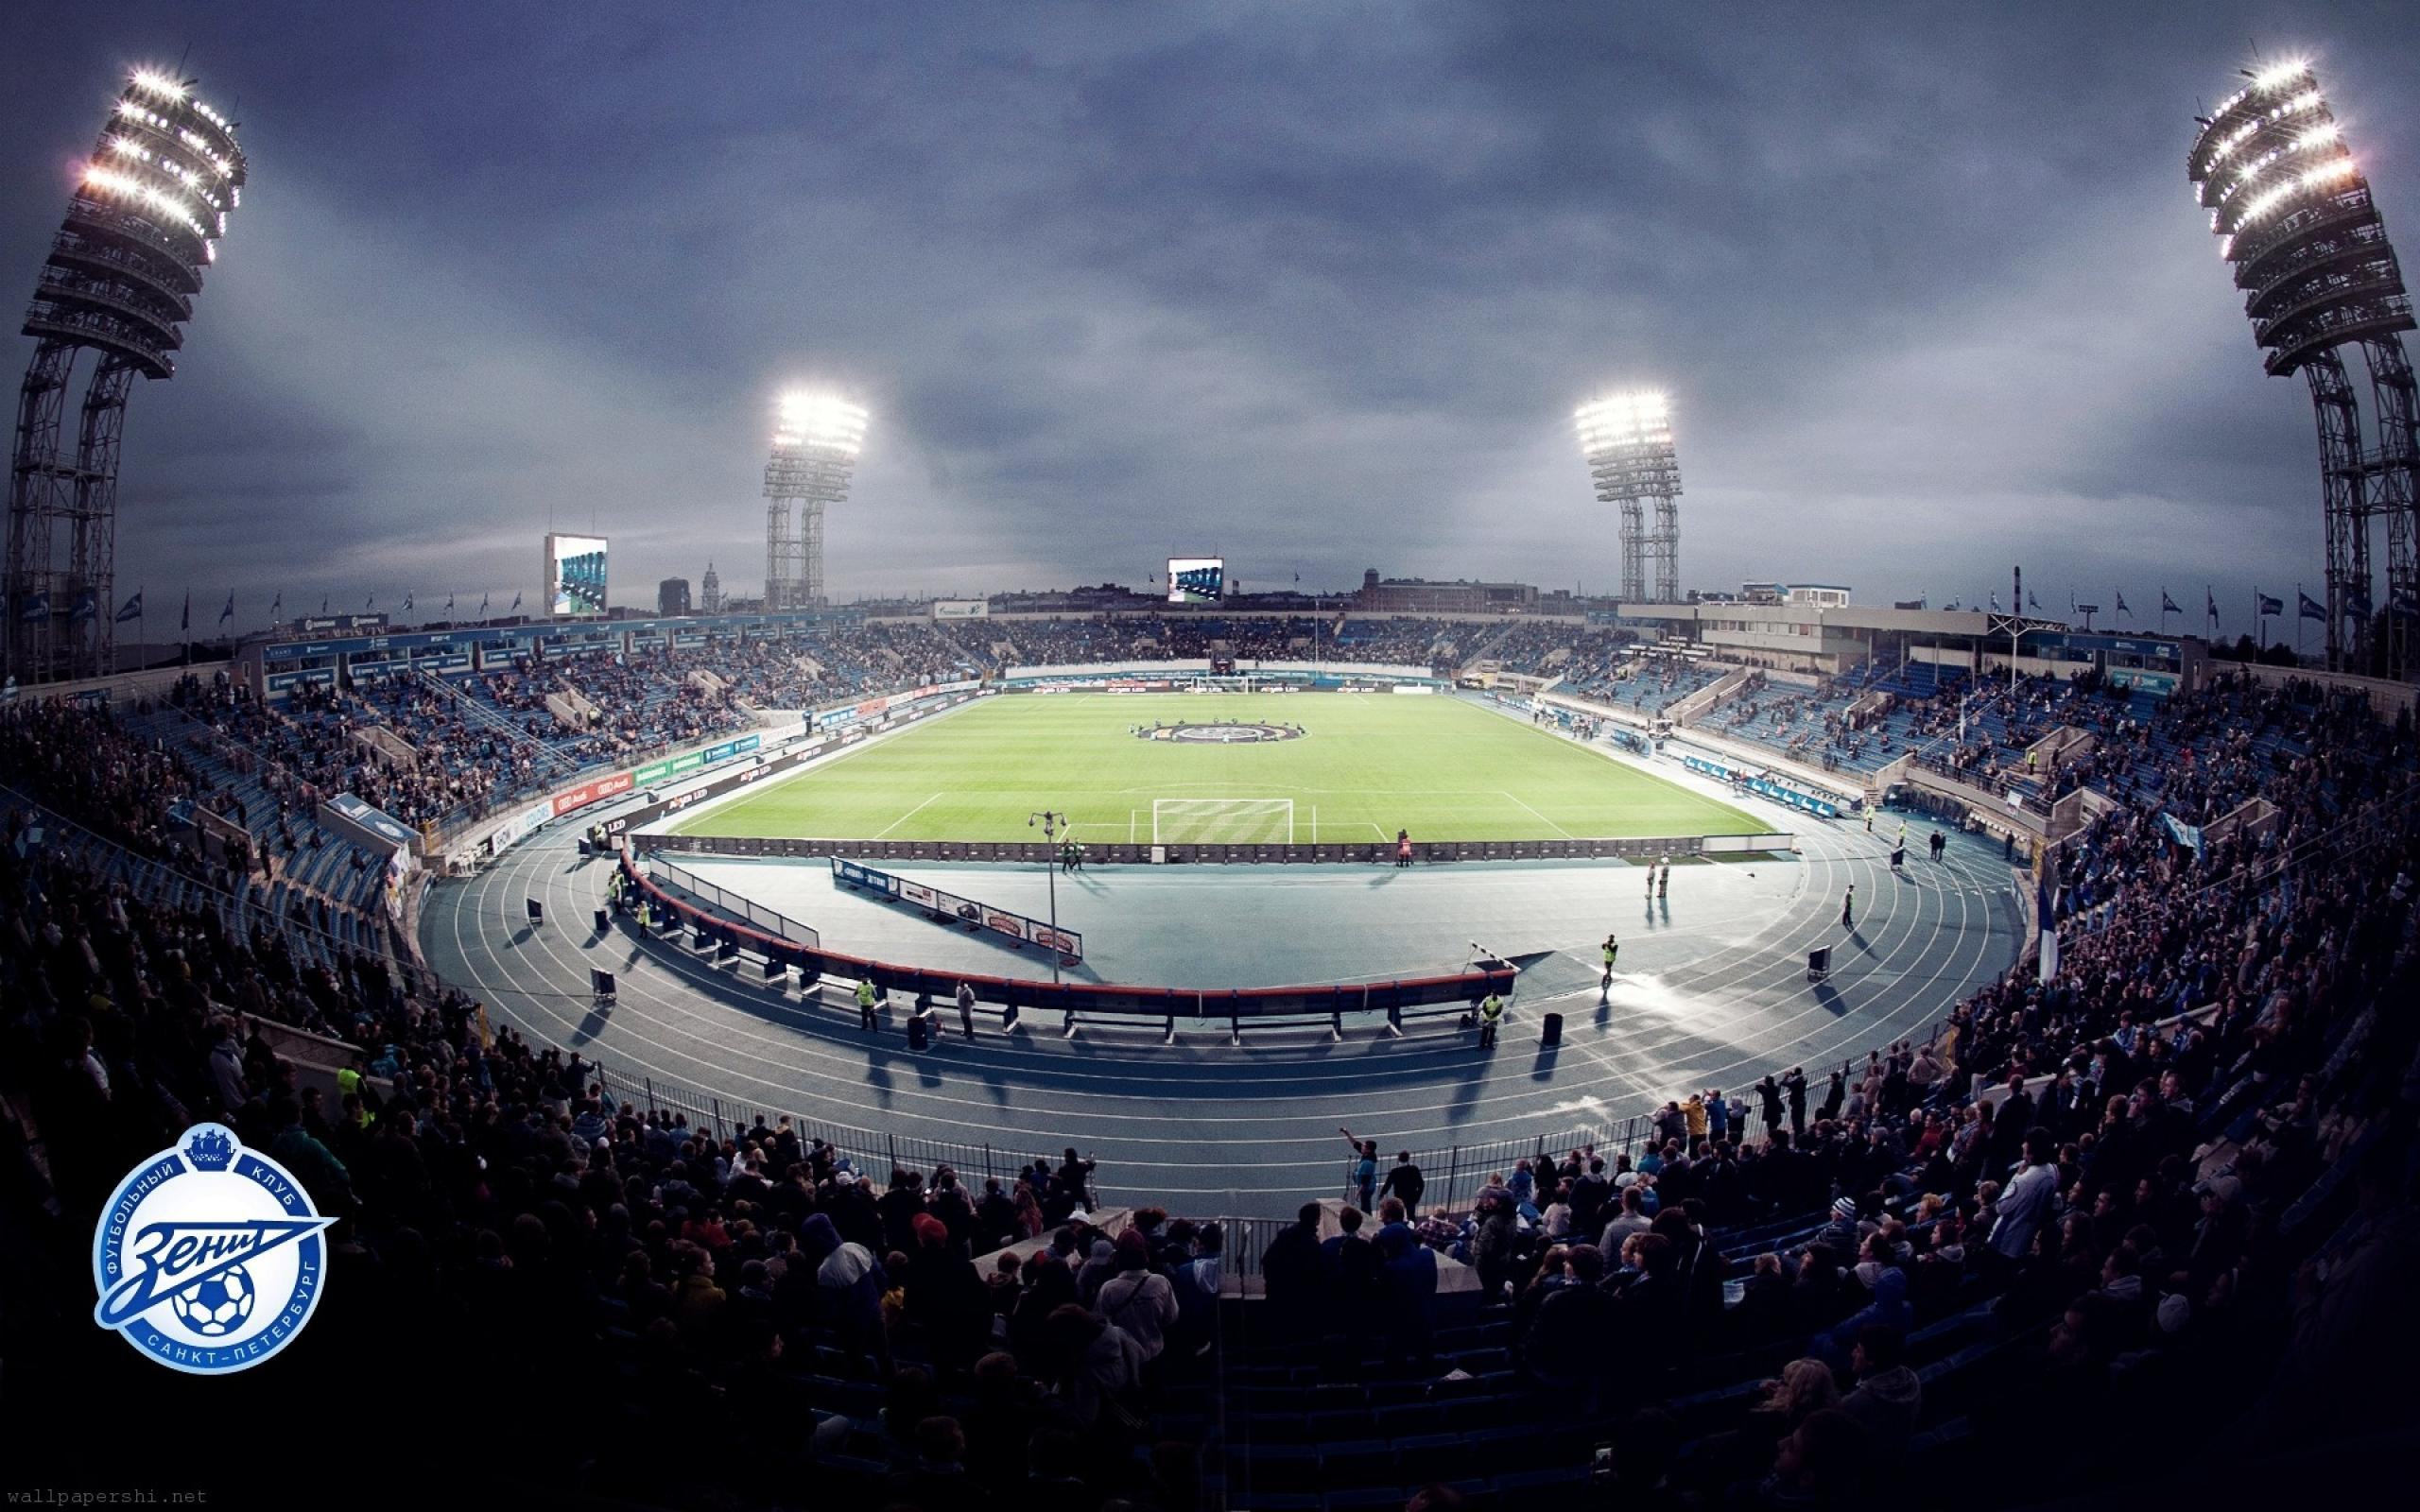 Hd soccer stadium wallpaper wallpapersafari - Soccer stadium hd ...